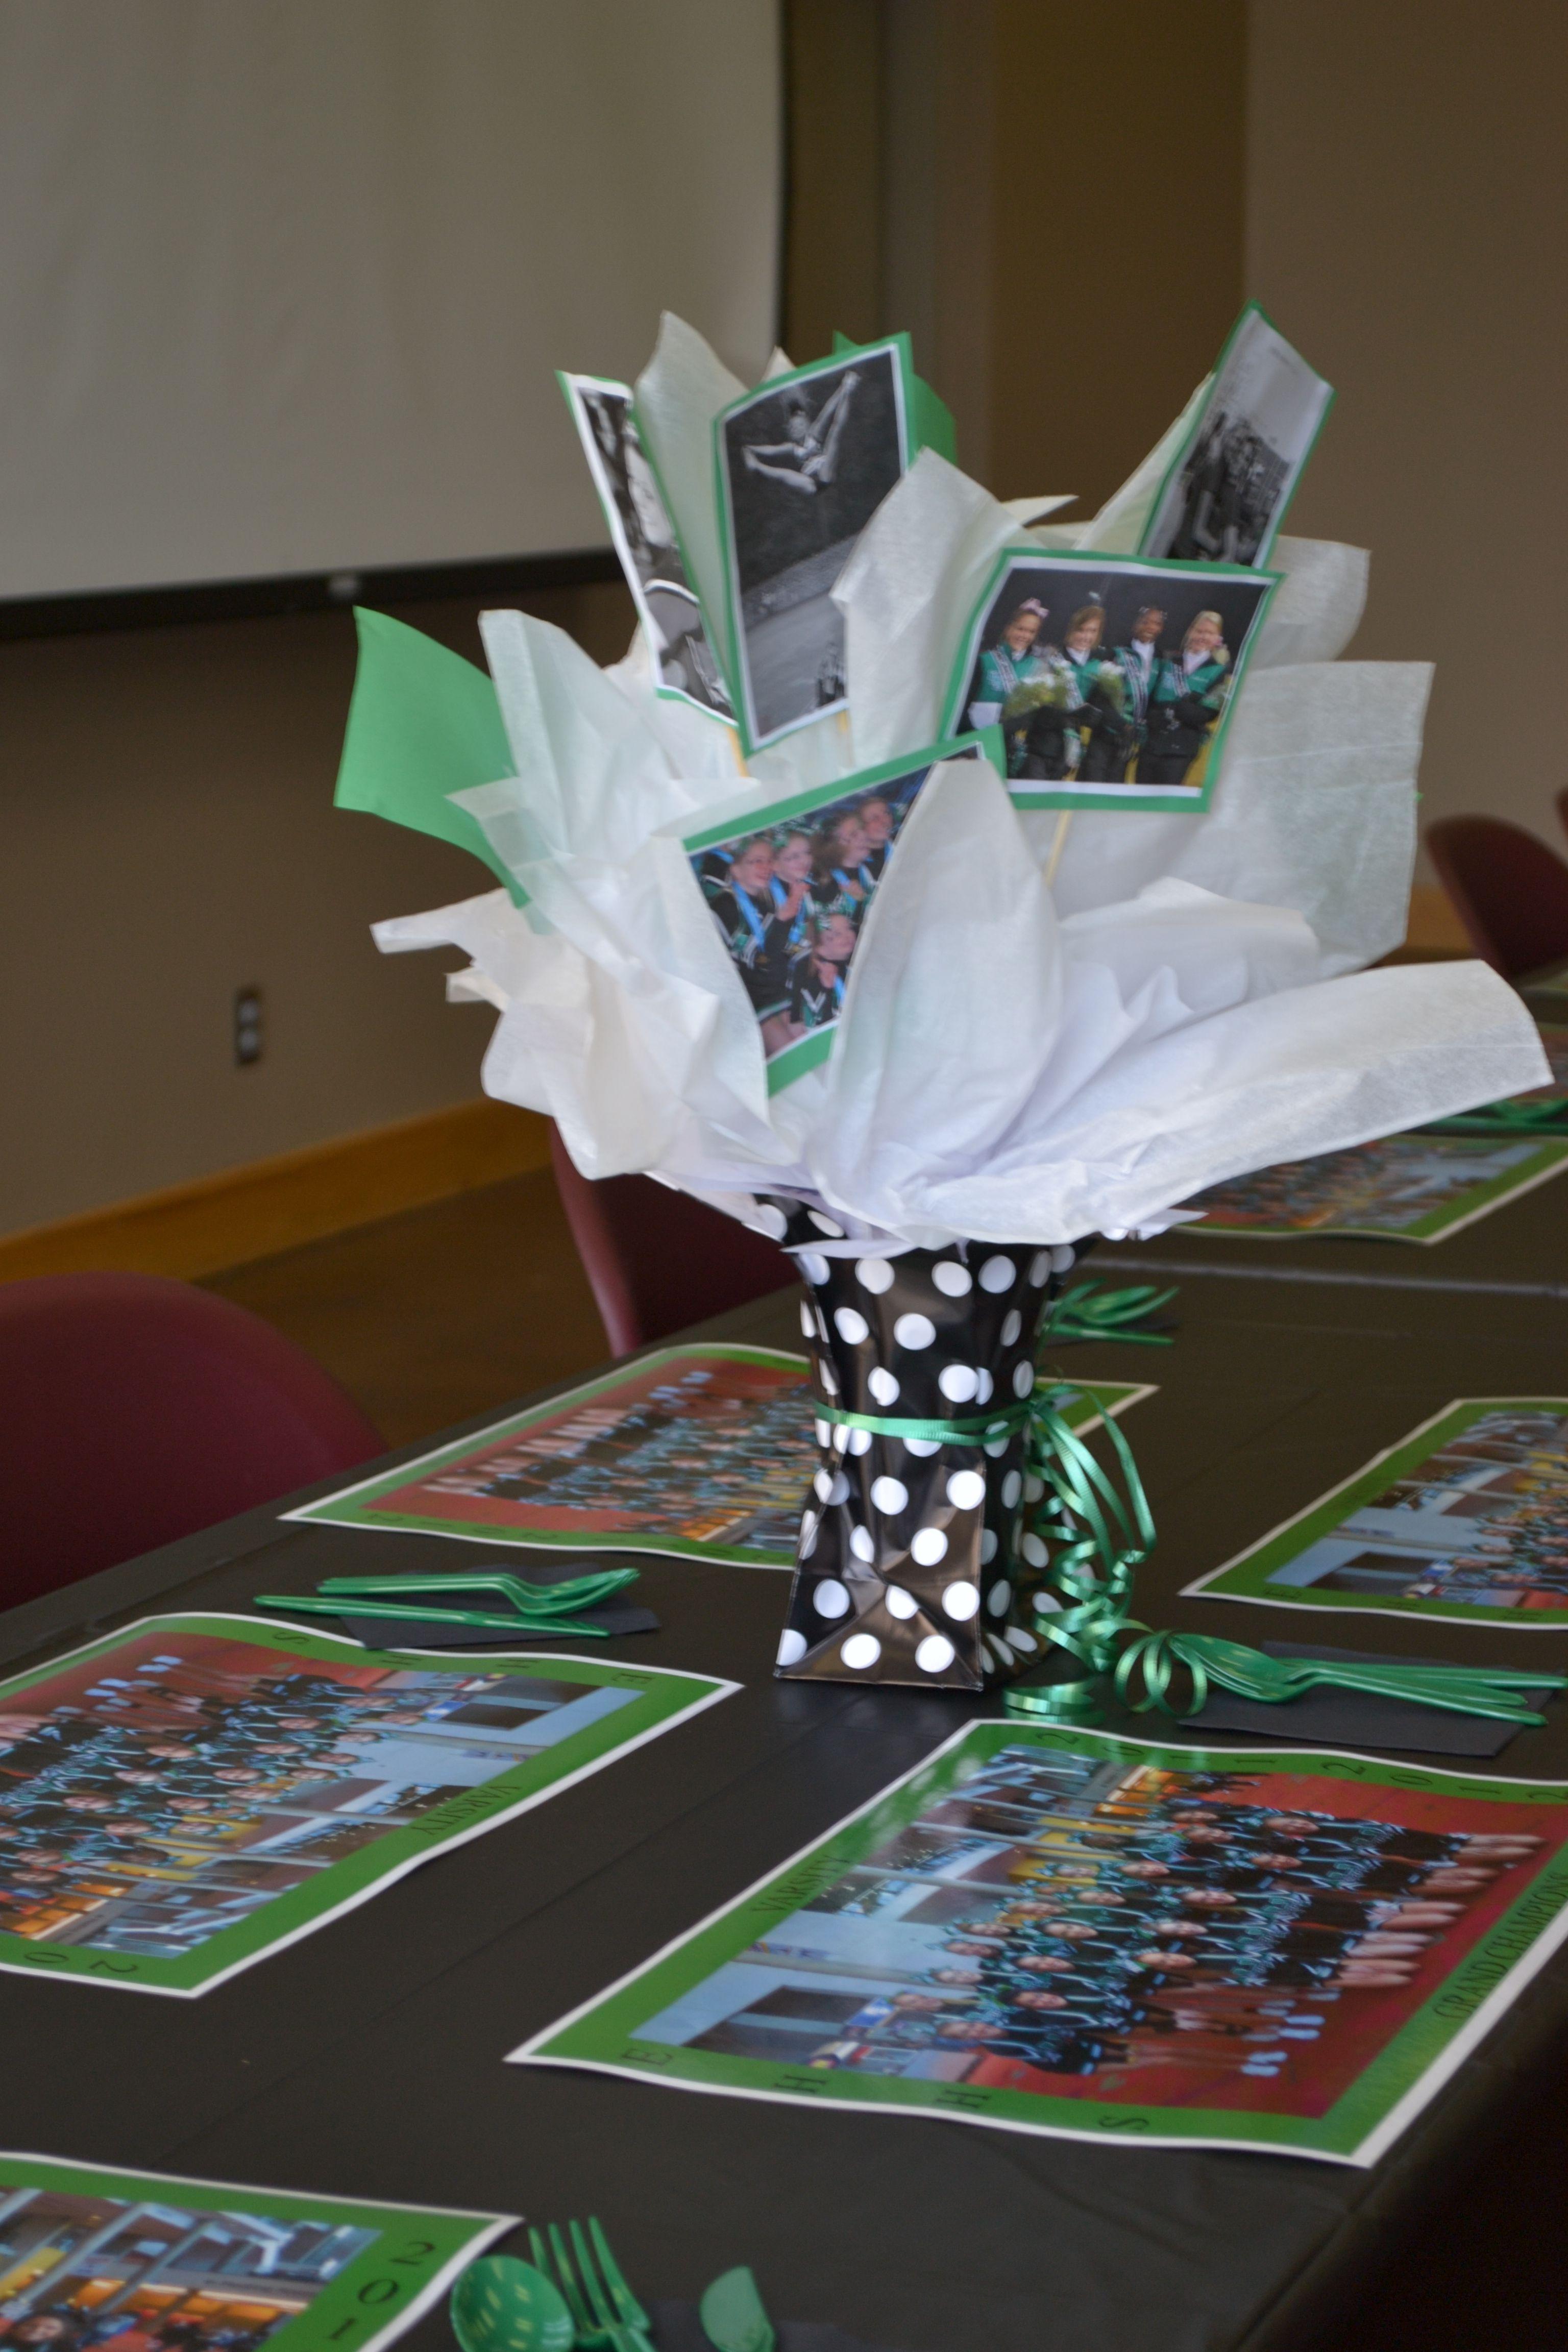 decorating ideas school banquet photos - Yahoo Search Results